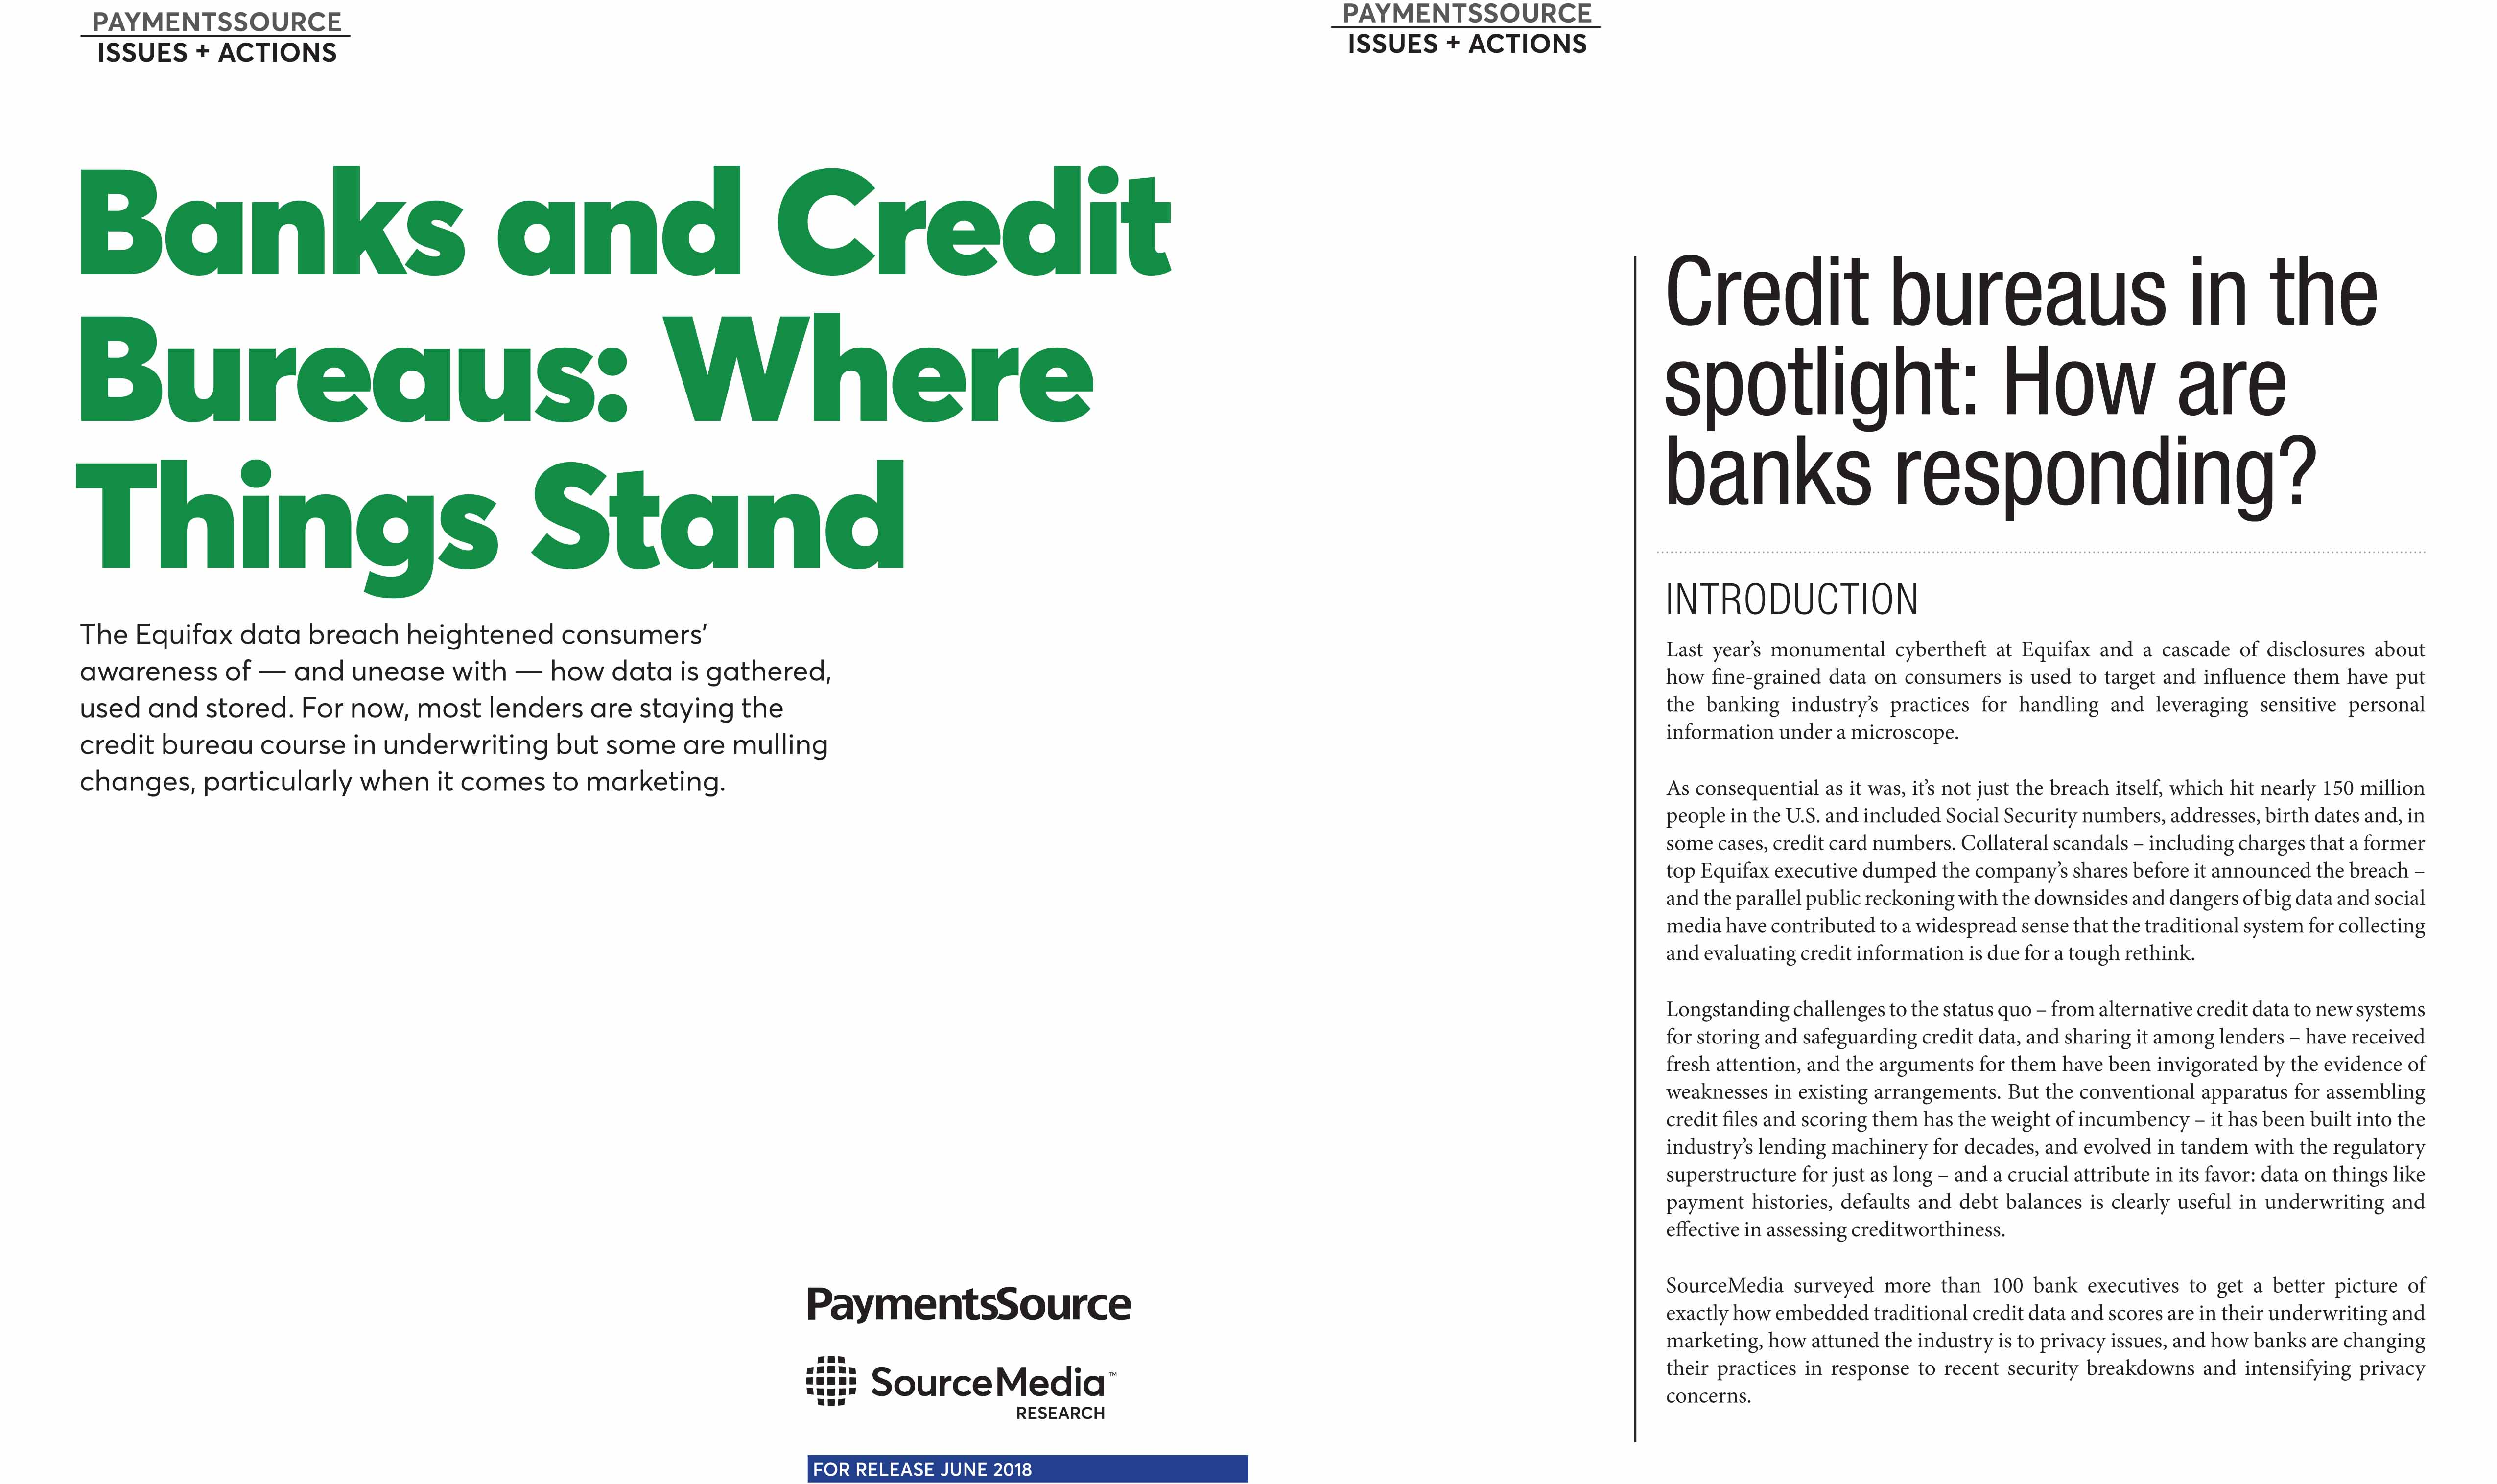 https://assets.sourcemedia.com/91/b6/05c2015b43f28fdd70073bd0afa1/cover-d37843-ps-credit-bureau-survey-white-paper-1.jpg